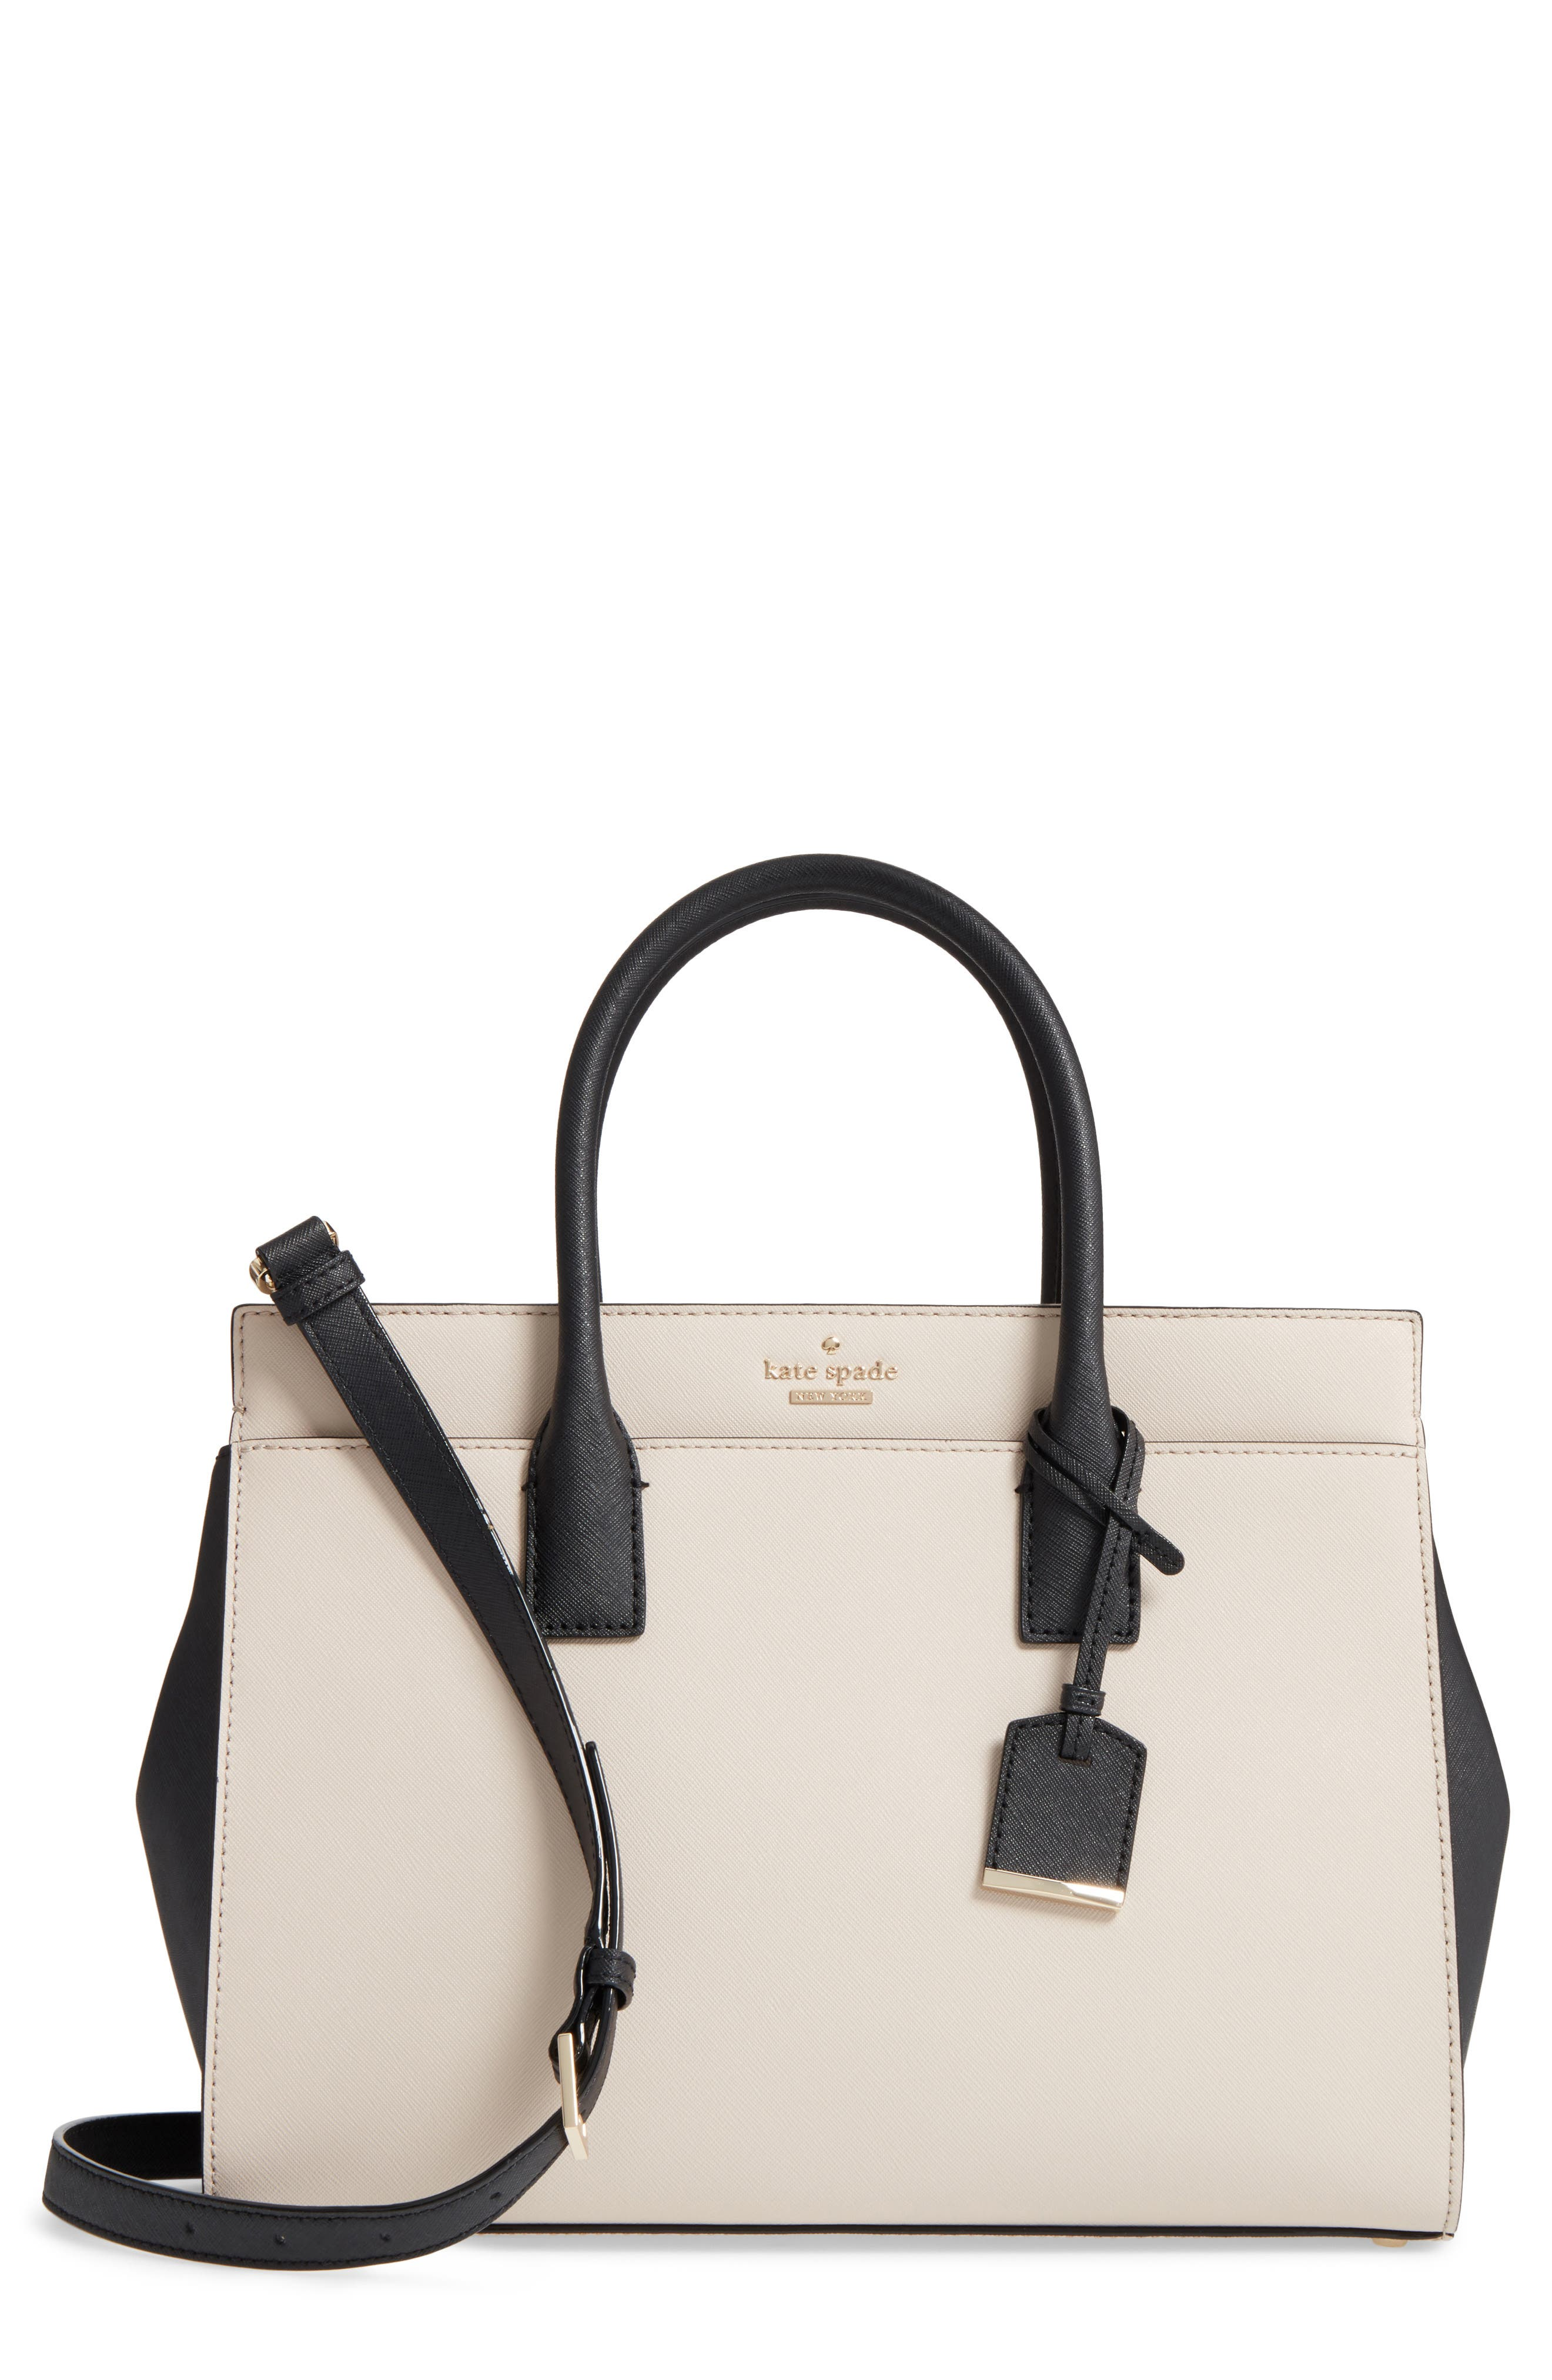 cameron street - candace leather satchel,                         Main,                         color, Tusk/ Black